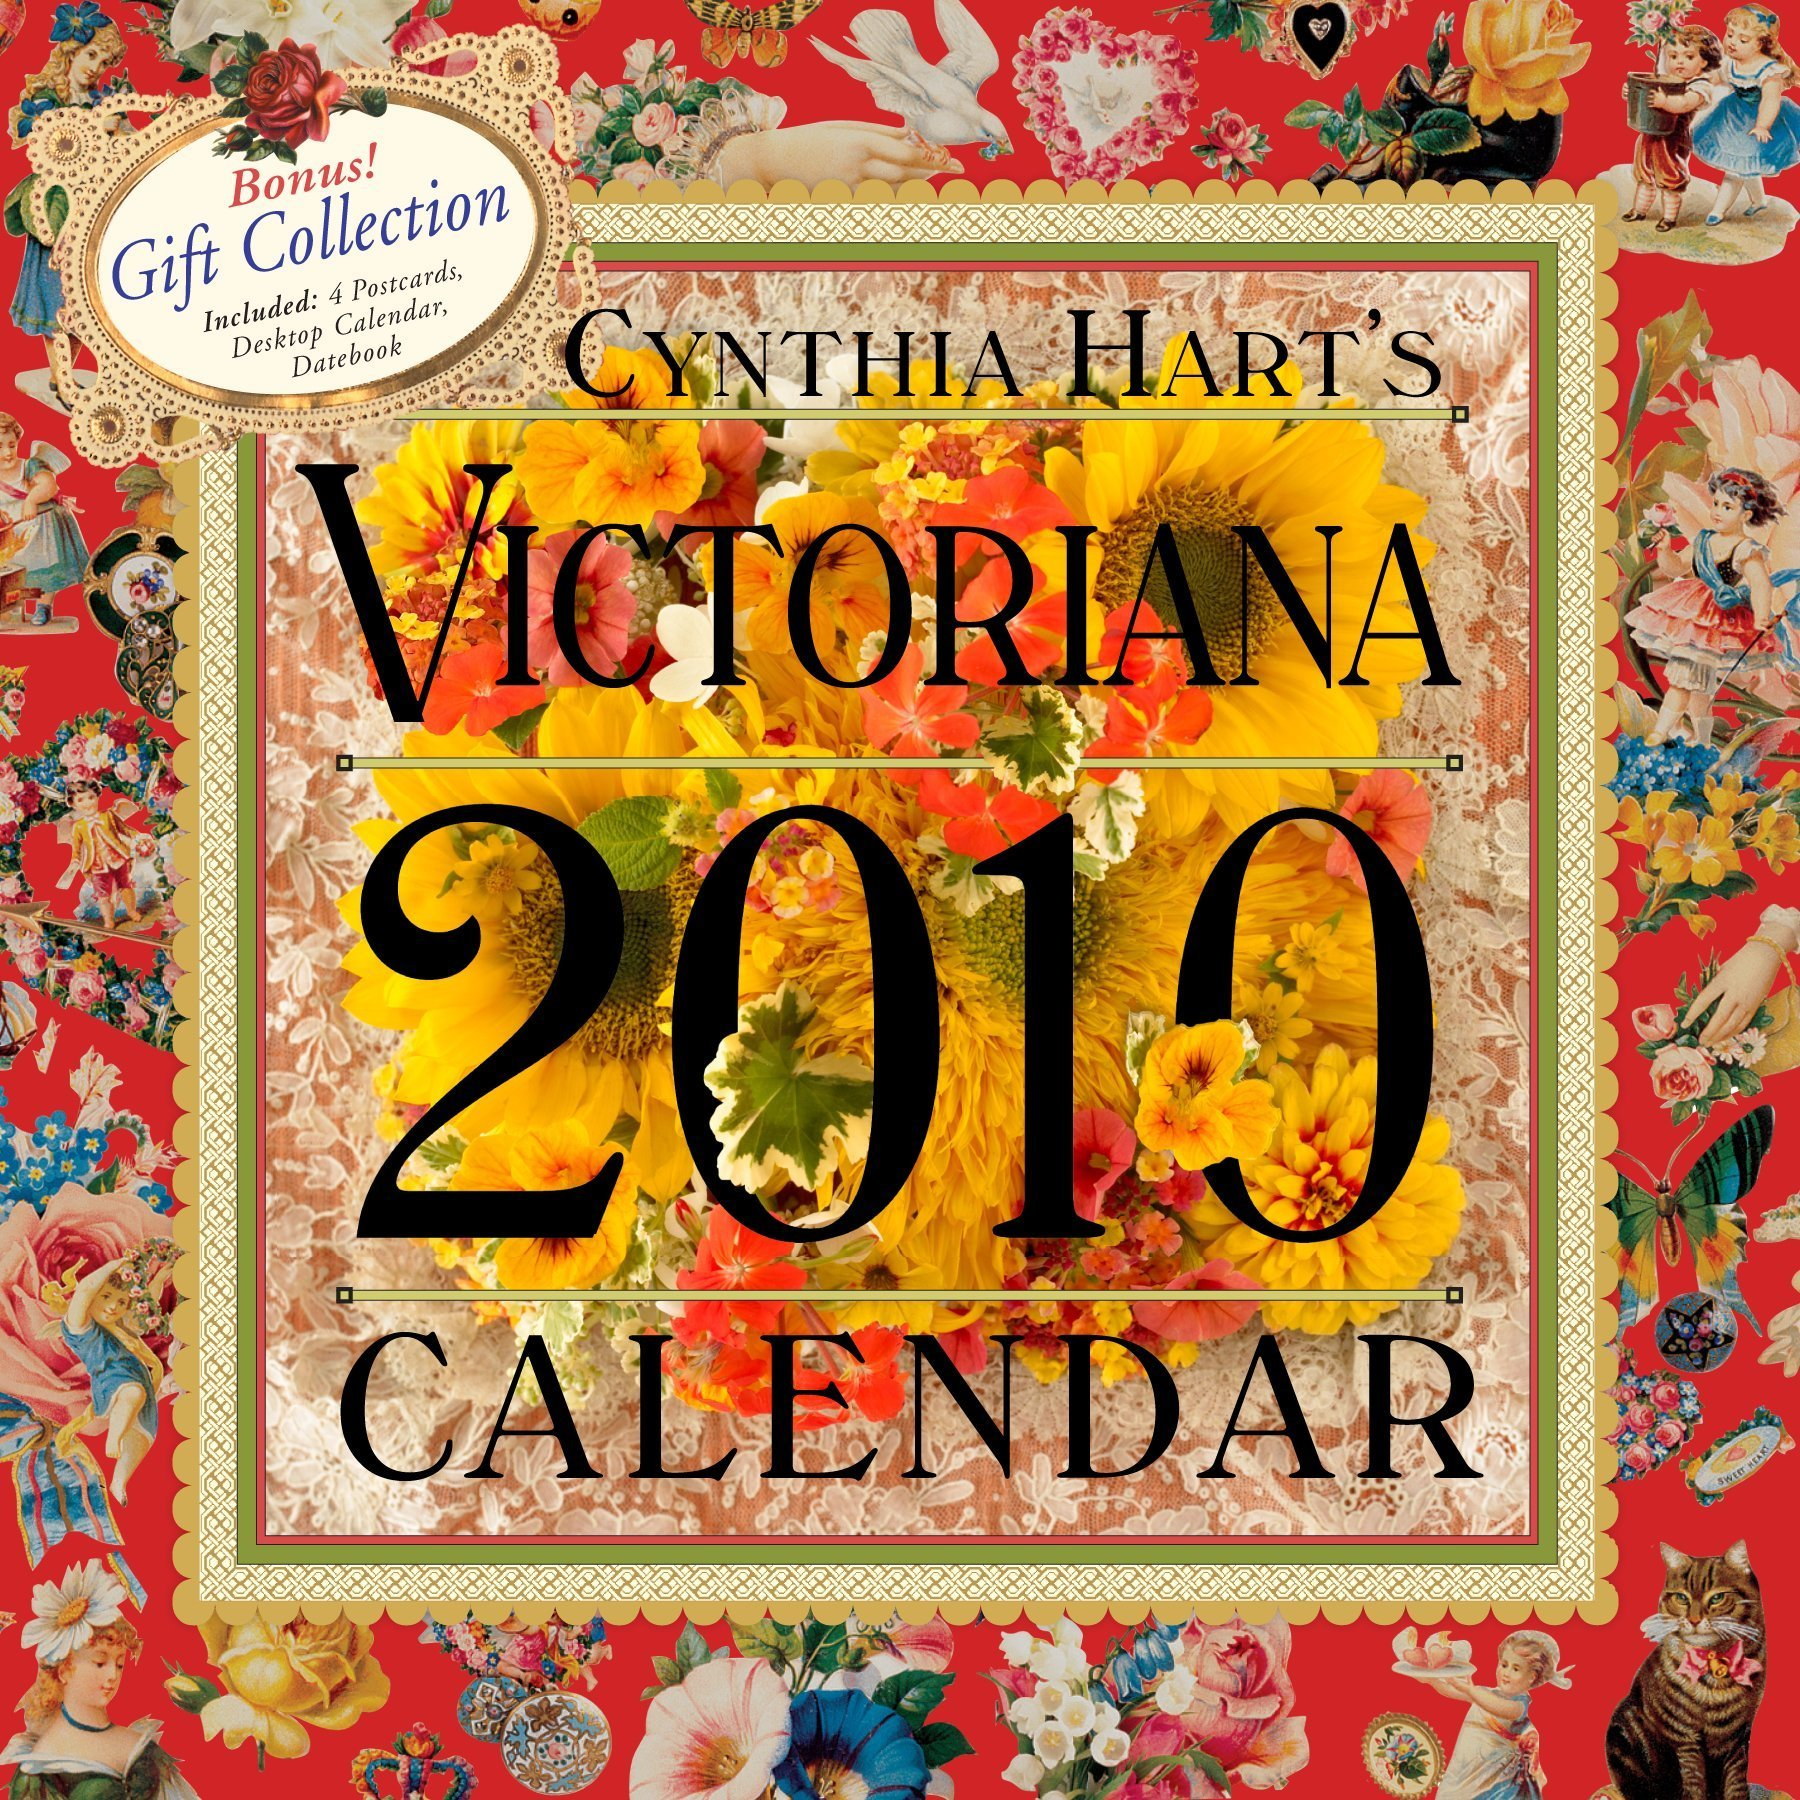 Cynthia Hart's Victoriana Calendar 2010